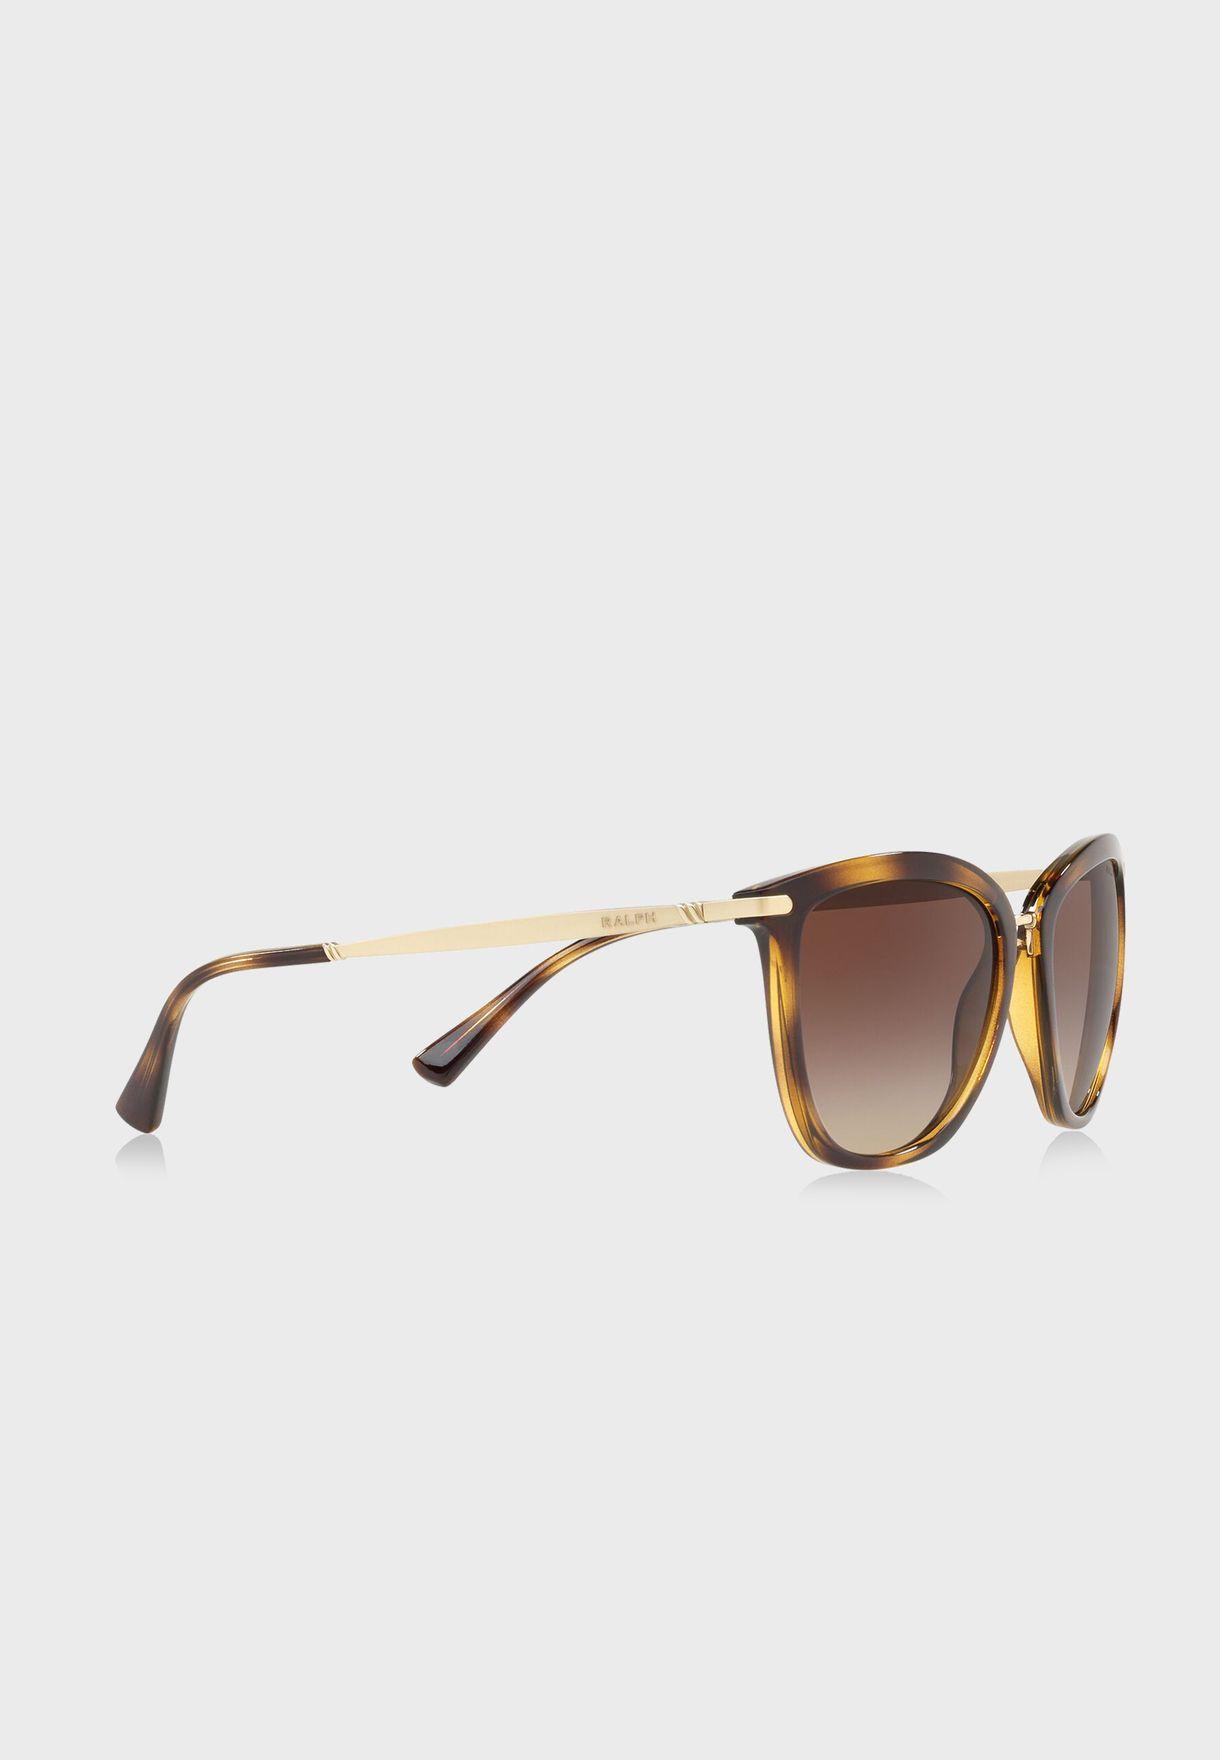 a325ca8e21b Shop Polo Ralph Lauren prints Wayfarer Sunglasses 8.05E+12 for Women ...